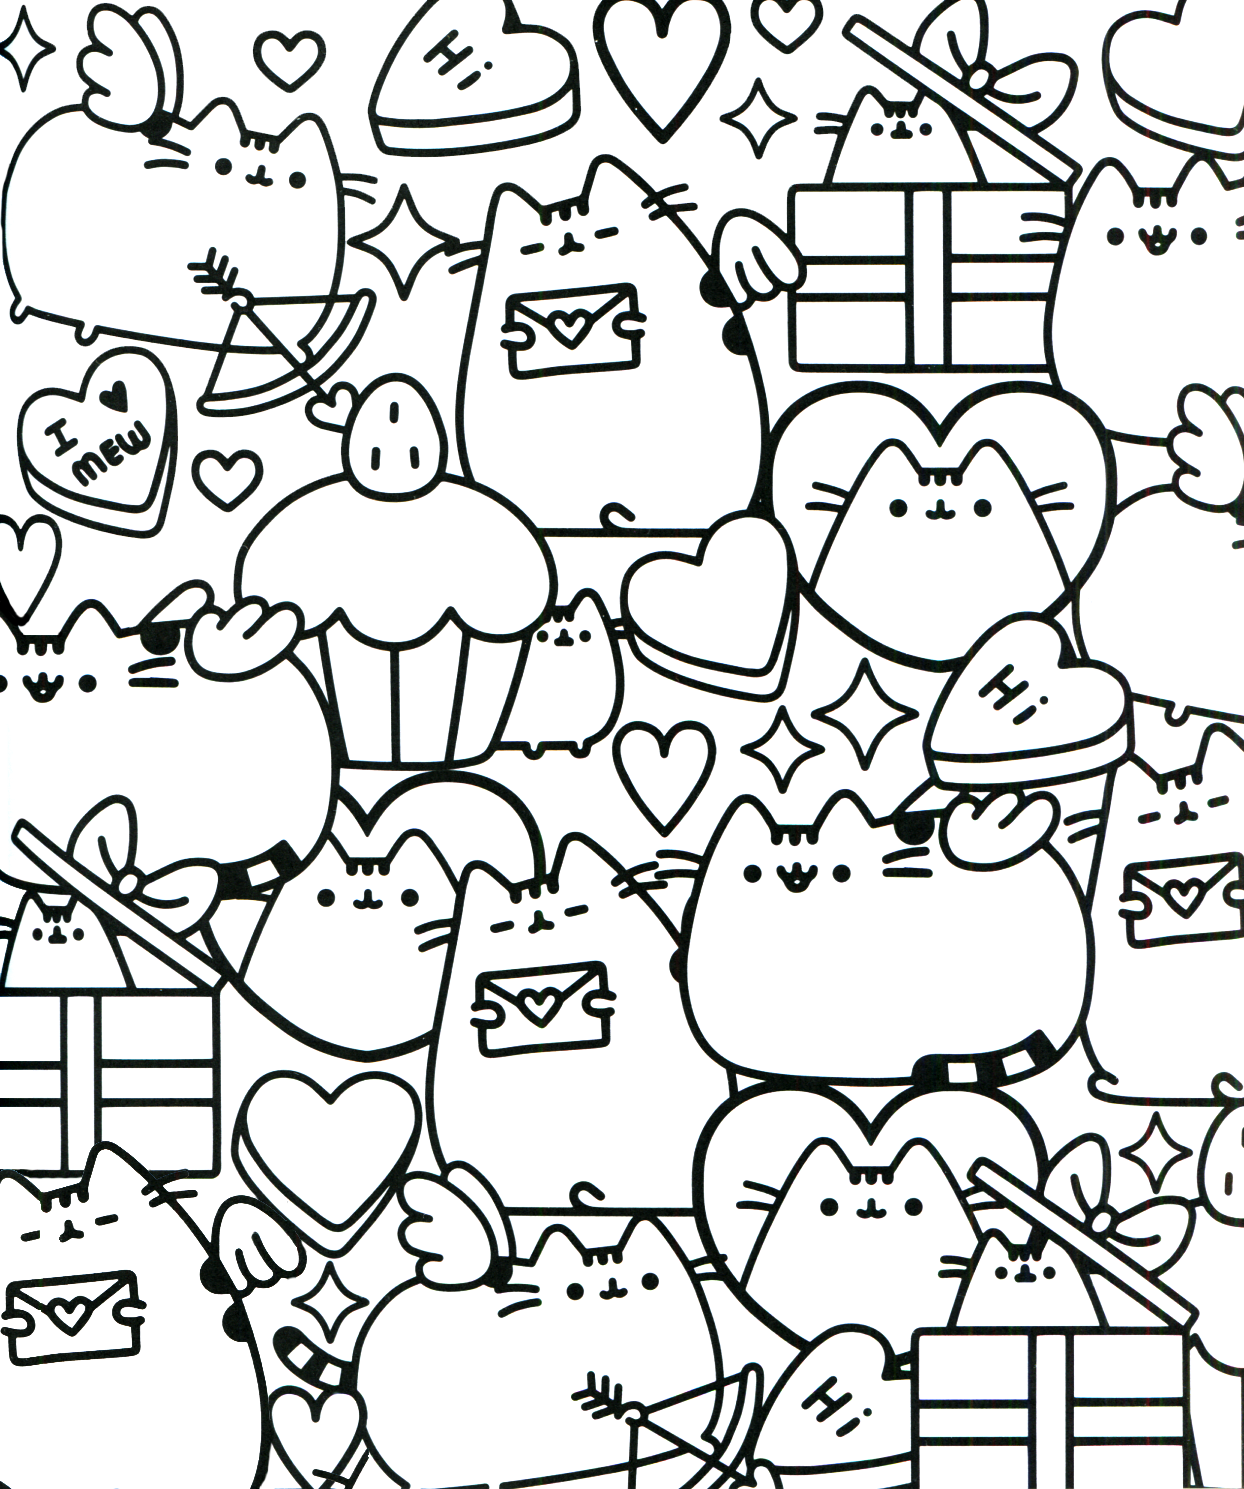 Pusheen Coloring Book Pusheen Pusheen The Cat Pusheen Coloring Pages Valentine Coloring Pages Unicorn Coloring Pages